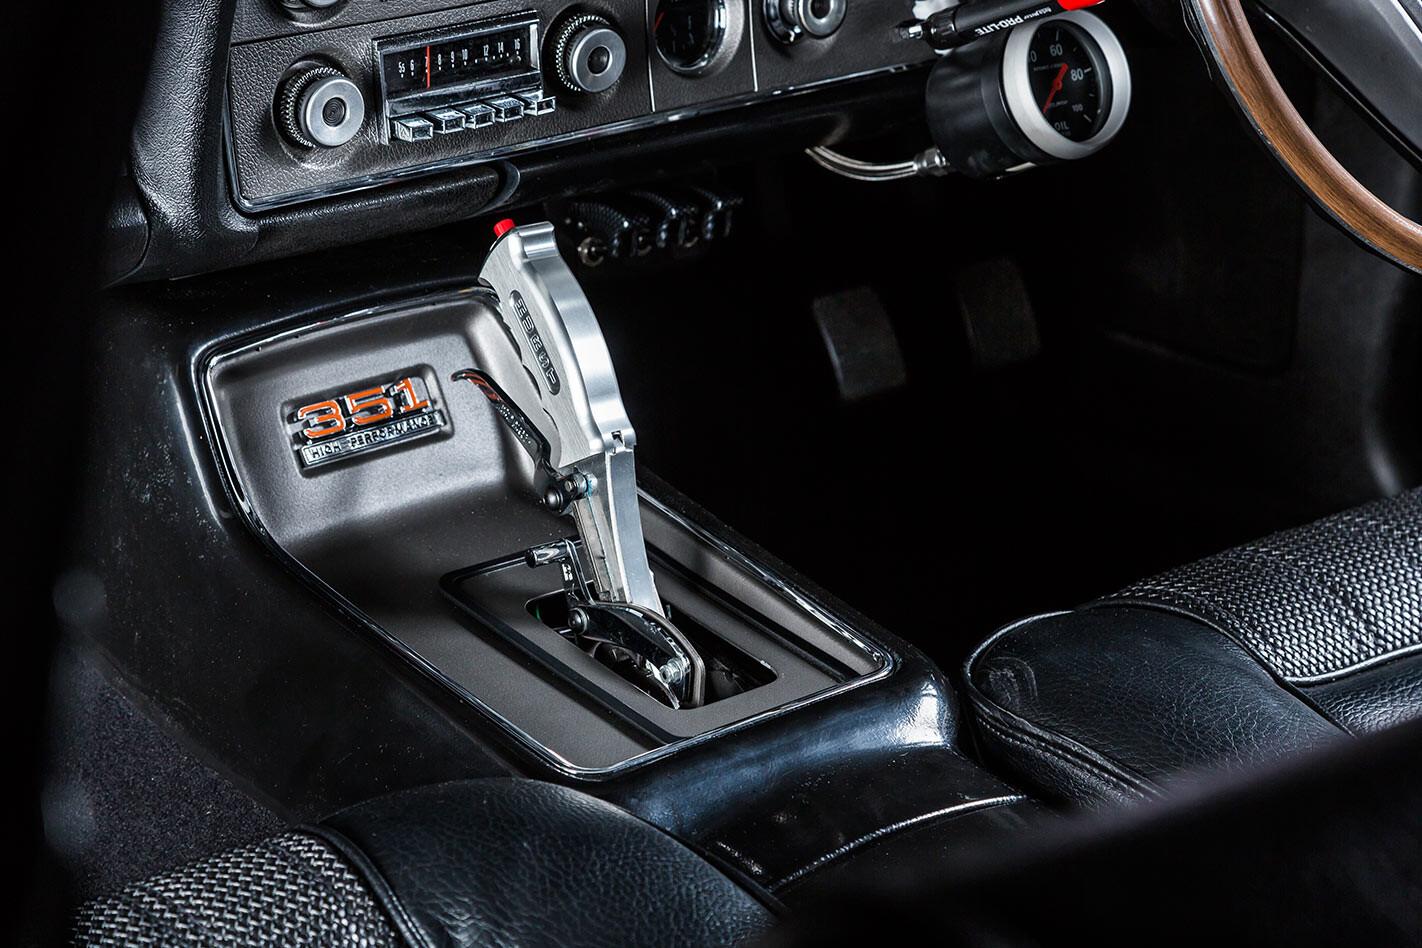 Ford Falcon XY shifter